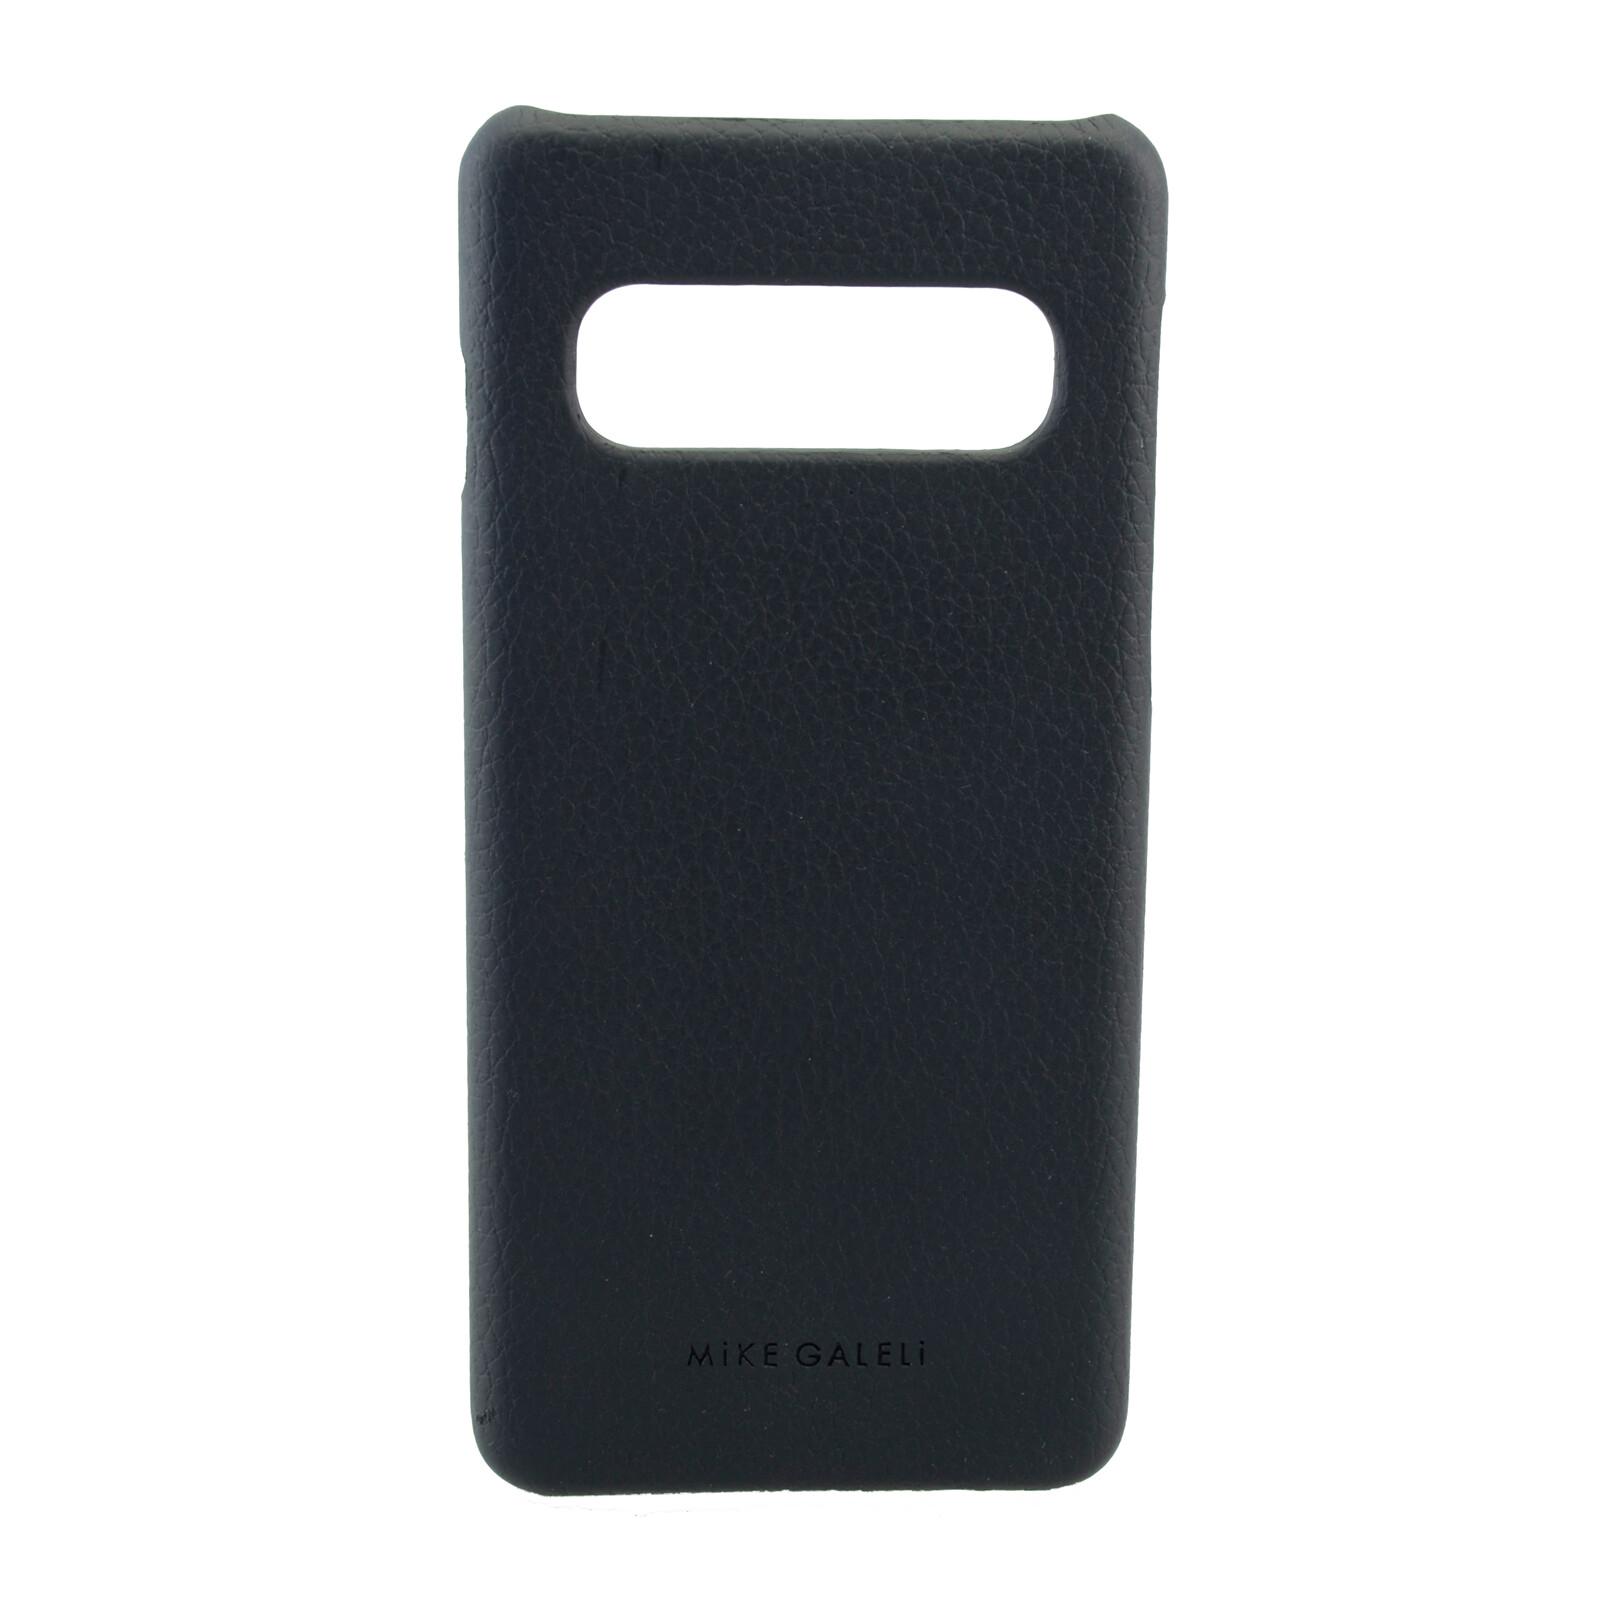 Galeli Back Cover Lenny Samsung Galaxy S10e